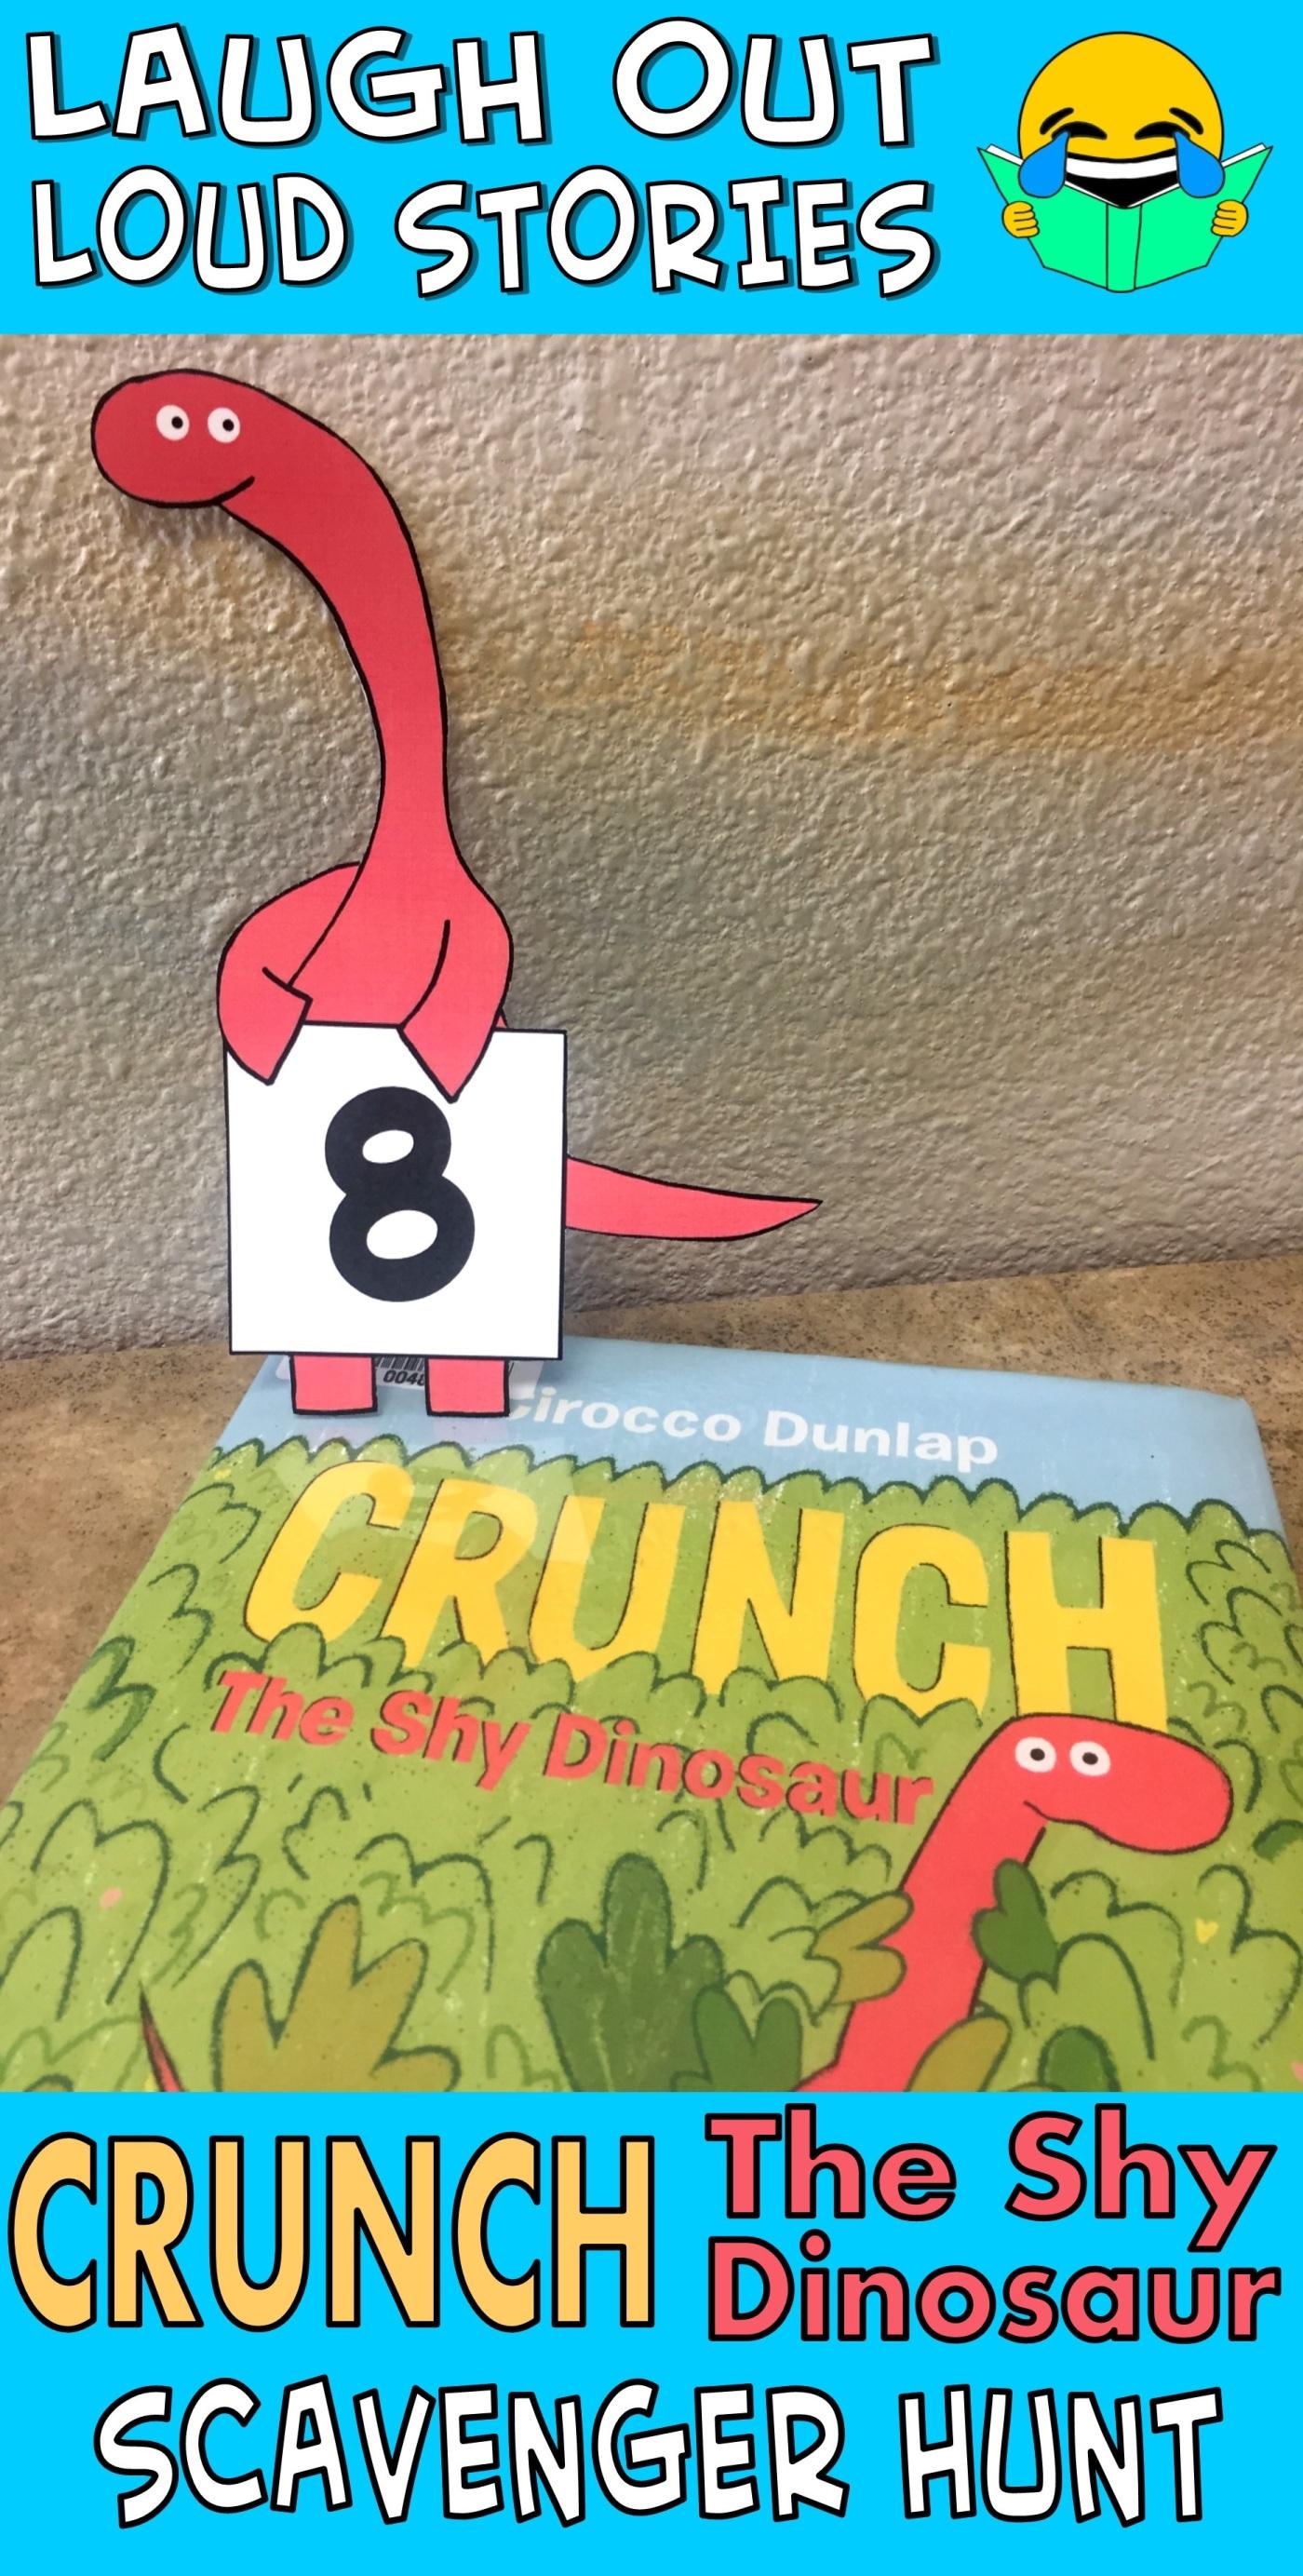 Laugh Out Loud Stories Crunch The Shy Dinosaur Scavenger